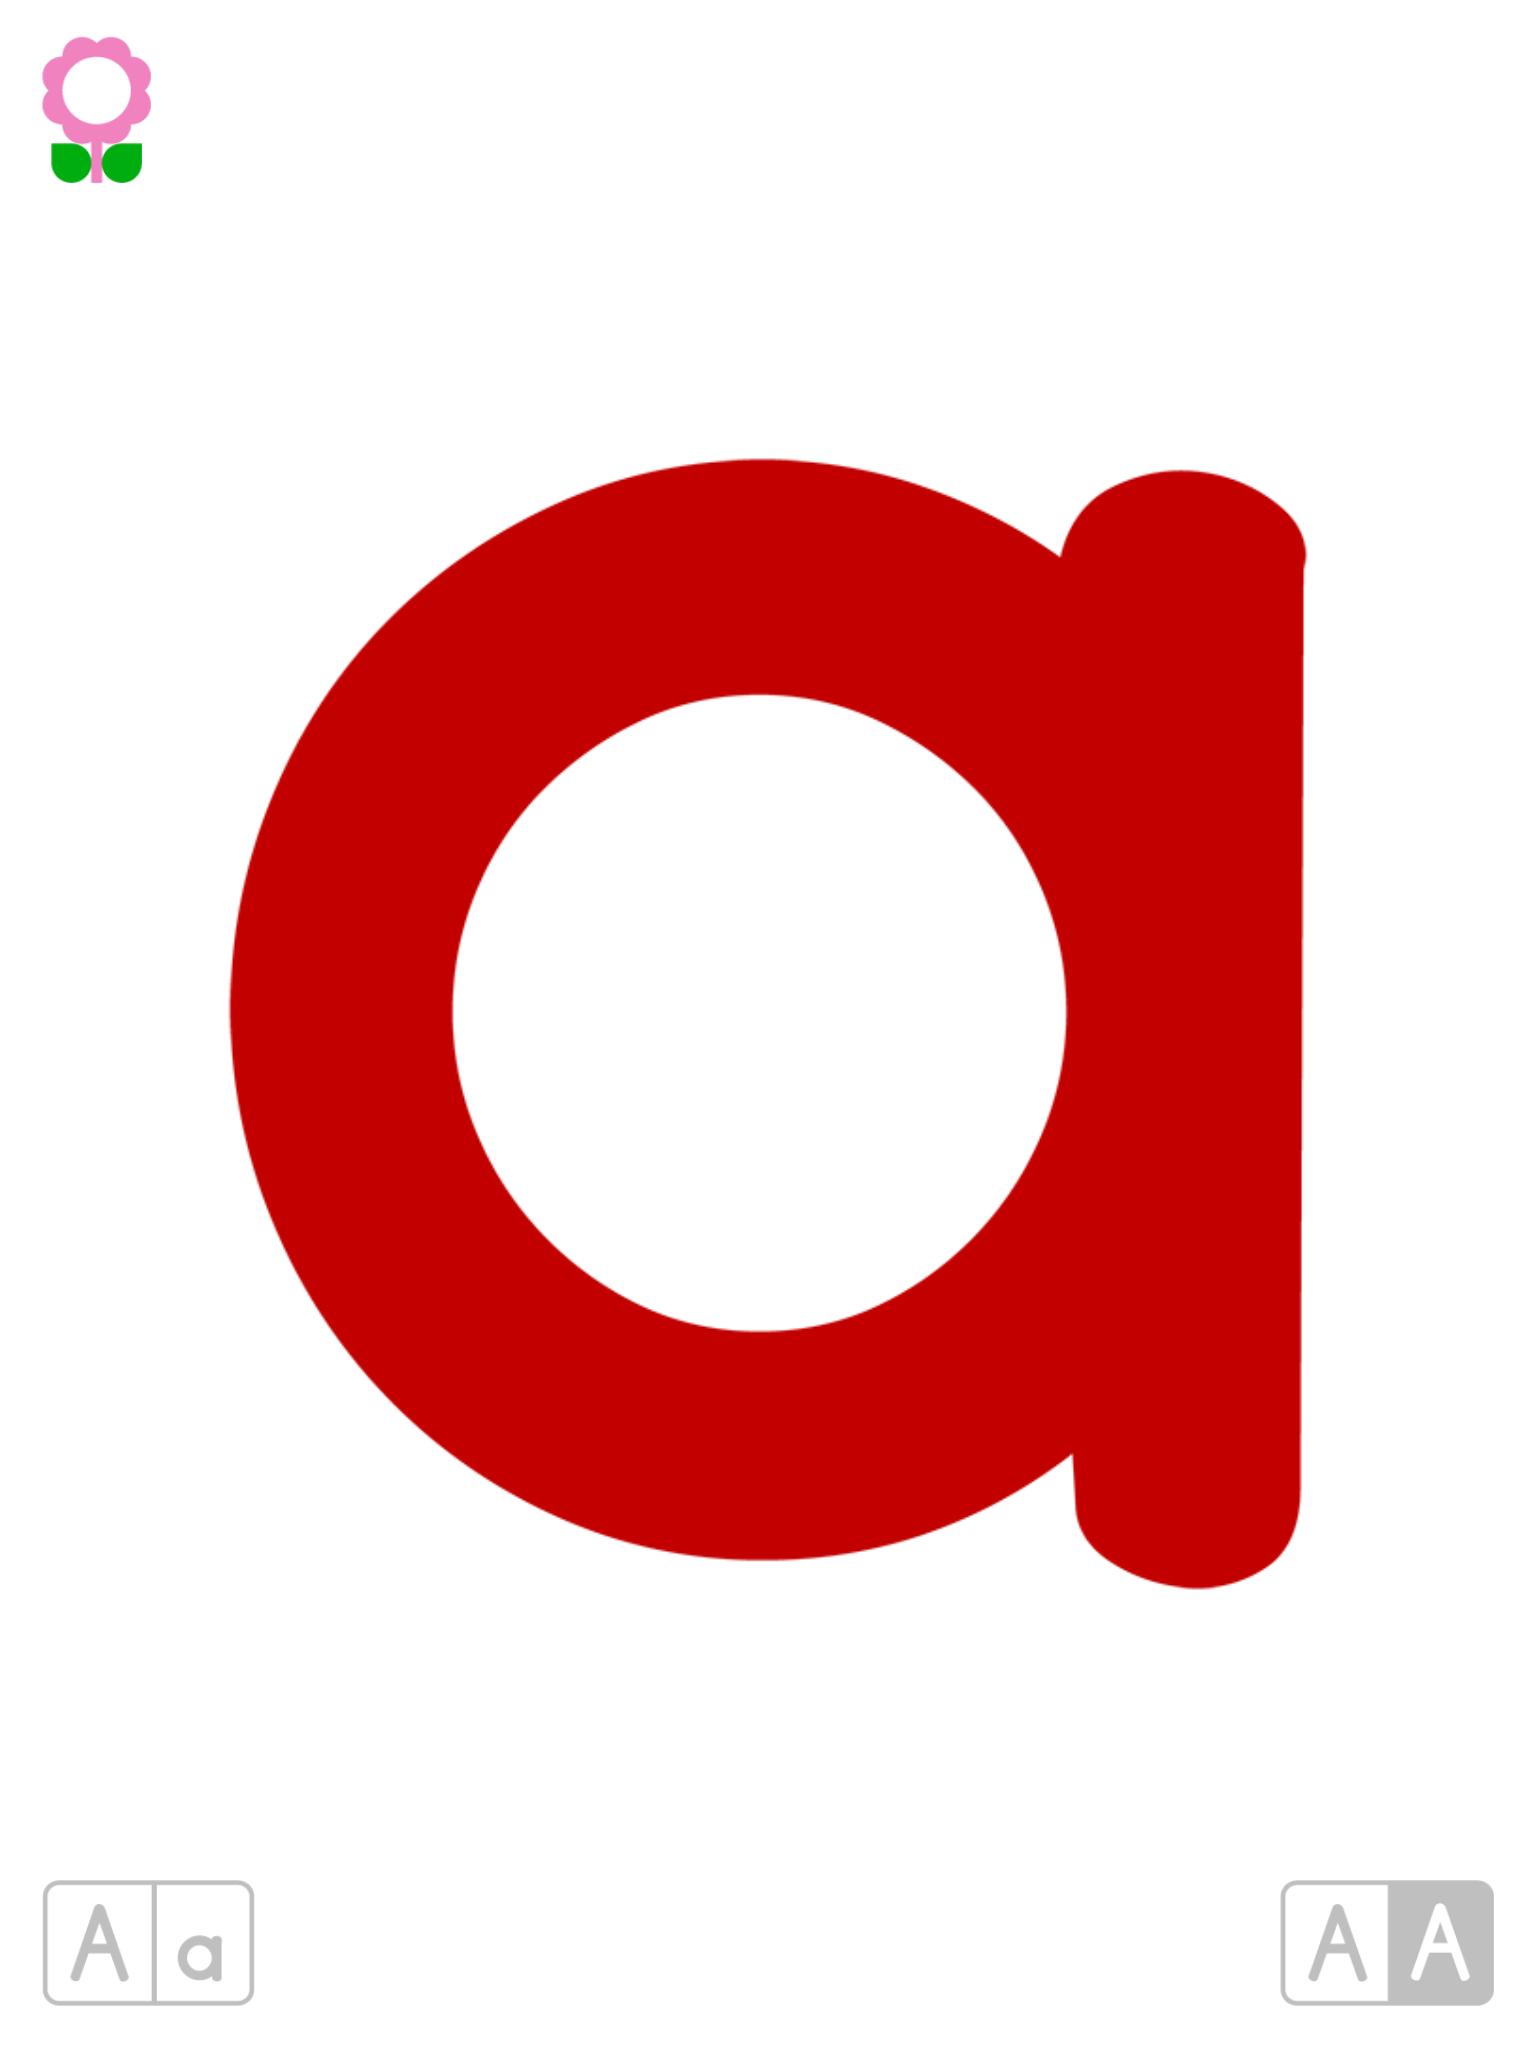 english alphabet pronunciation